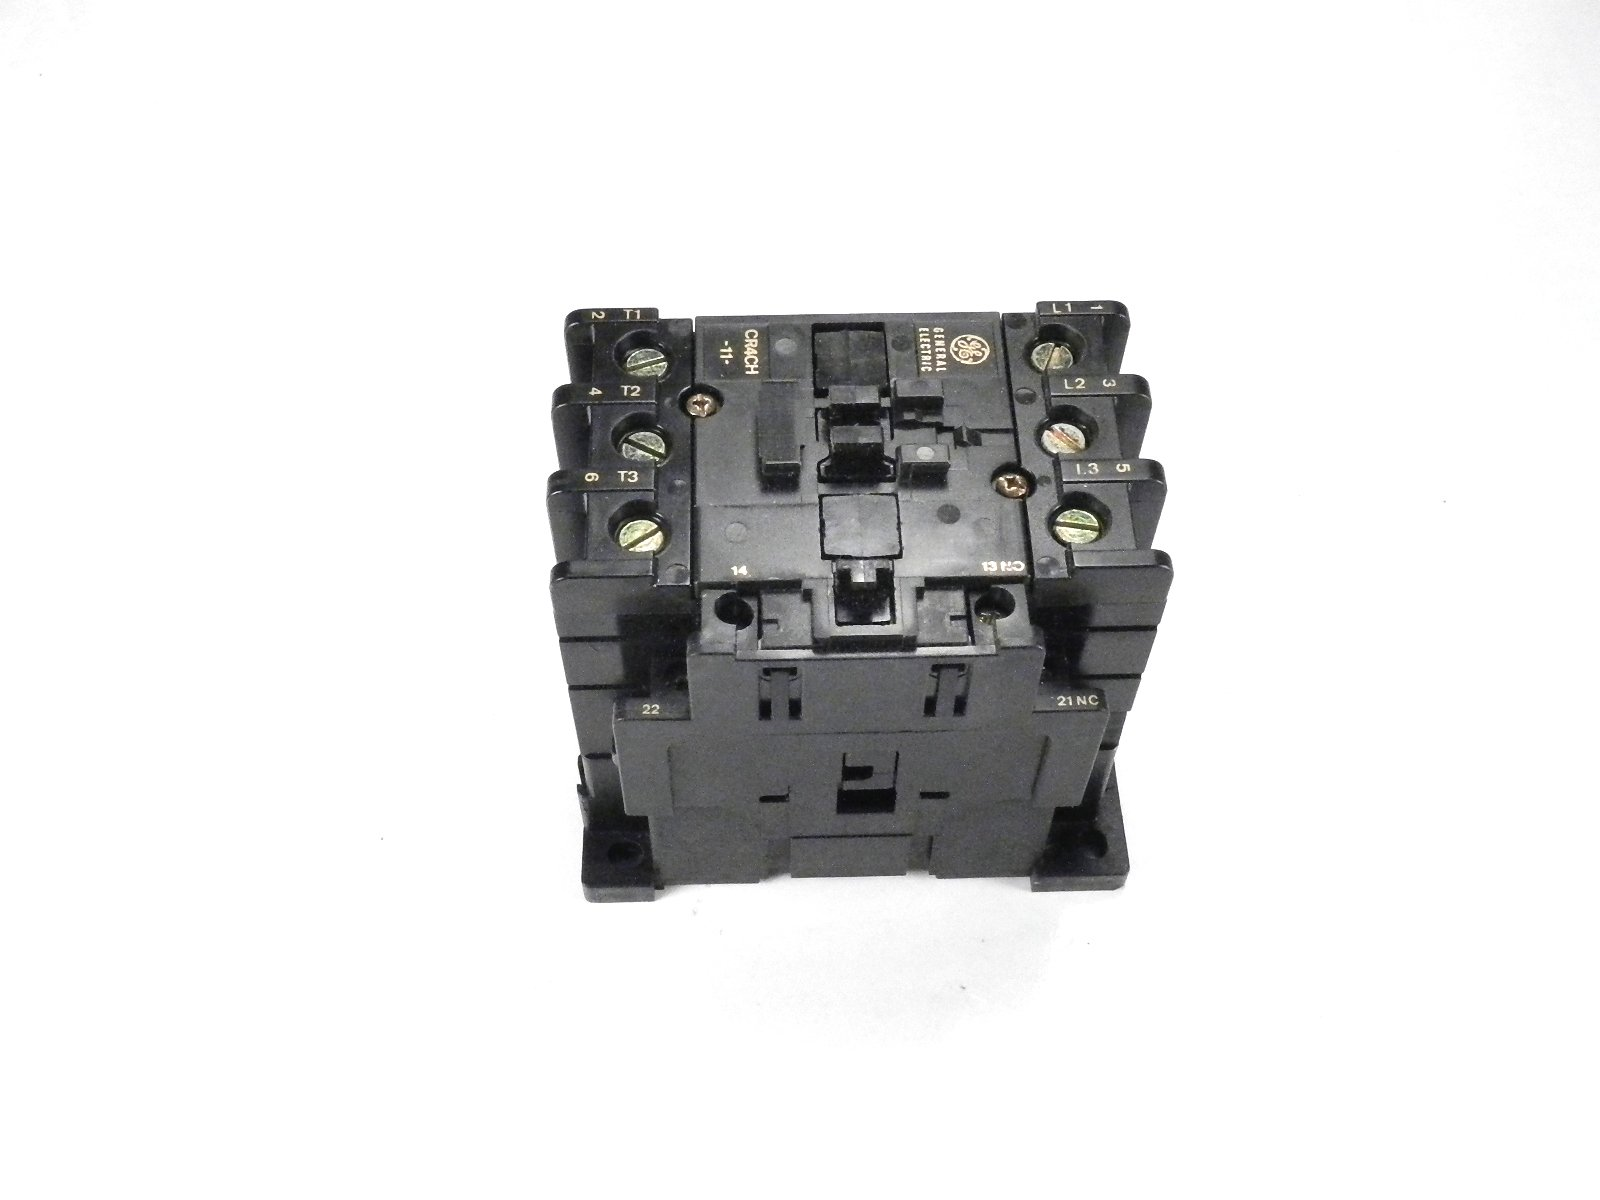 CR4CHH/CR4G3WS GE MAGNETIC MOTOR STARTER OVERLOAD ADJUSTABLE 25-32AMP 24V AC COIL by Sprecher & Schuh (Image #3)